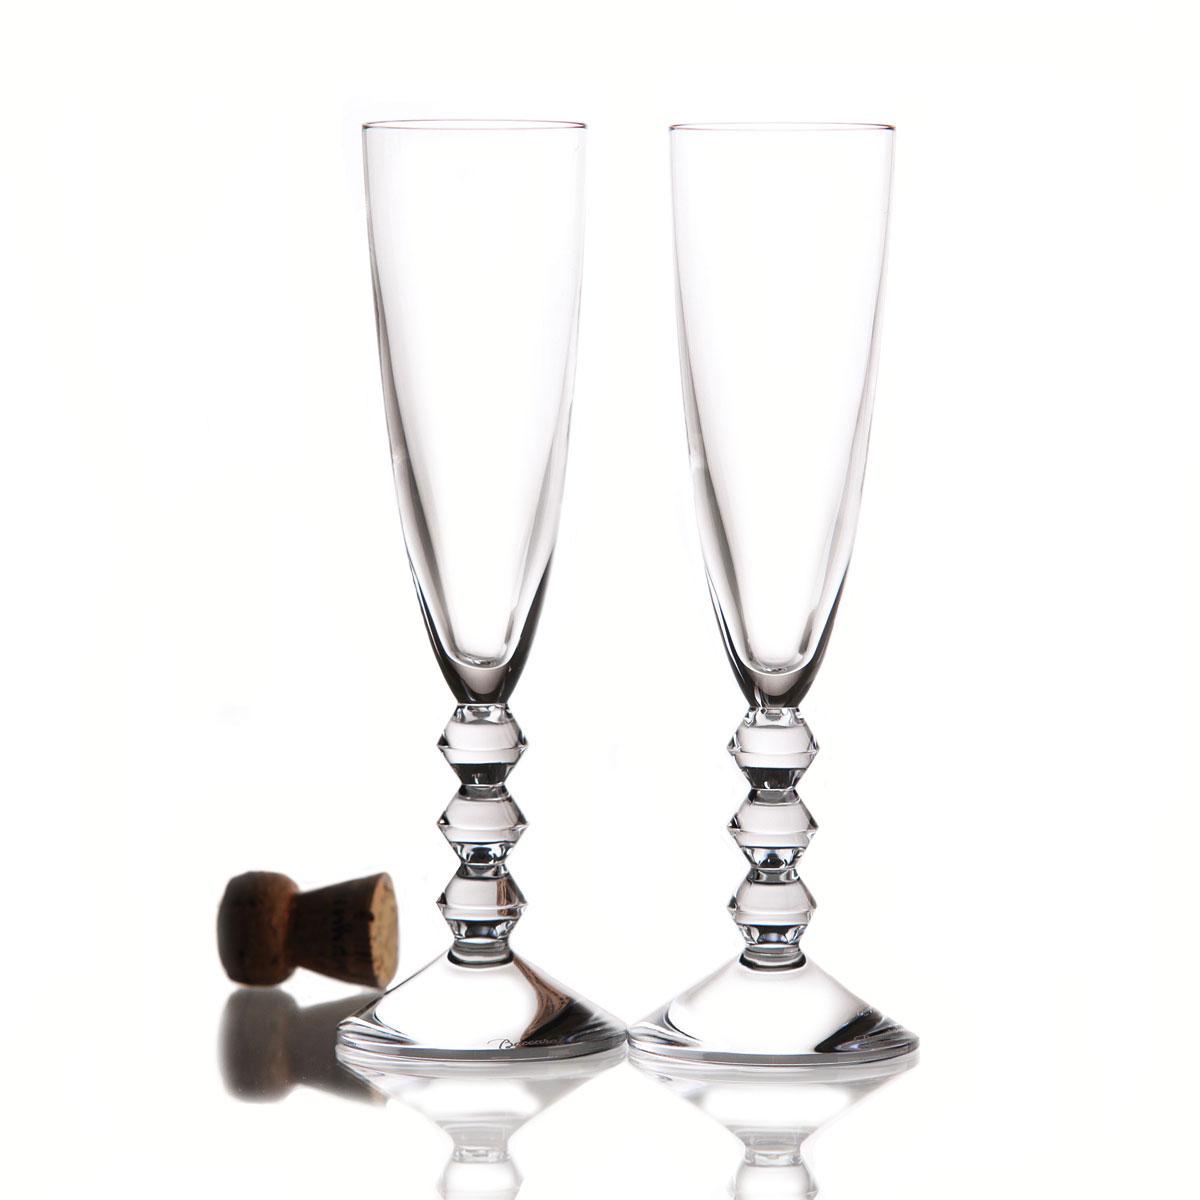 Baccarat Crystal, Vega Clear Crystal Flute, Pair